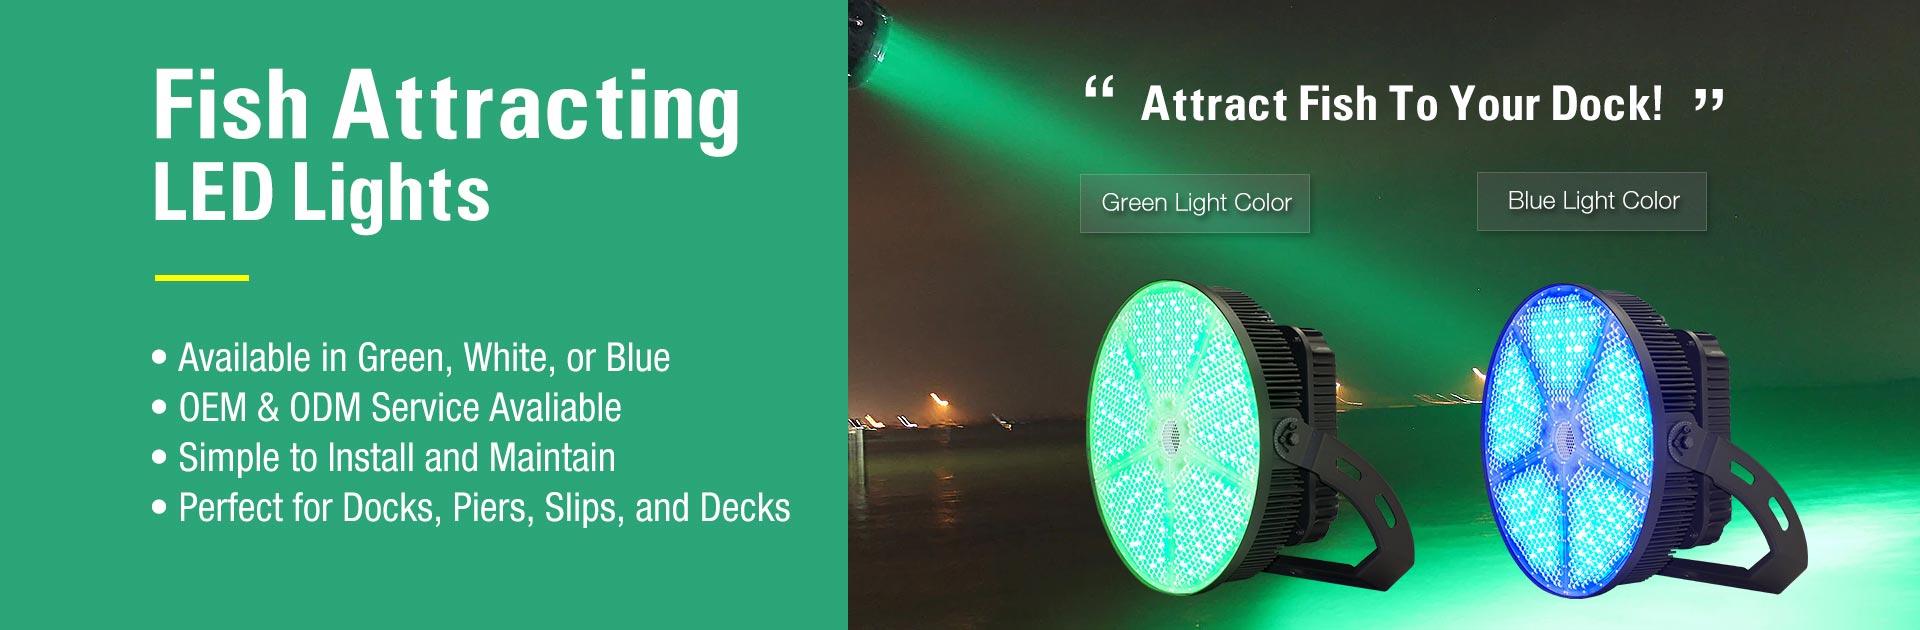 Fish-Attracting-LED-Light